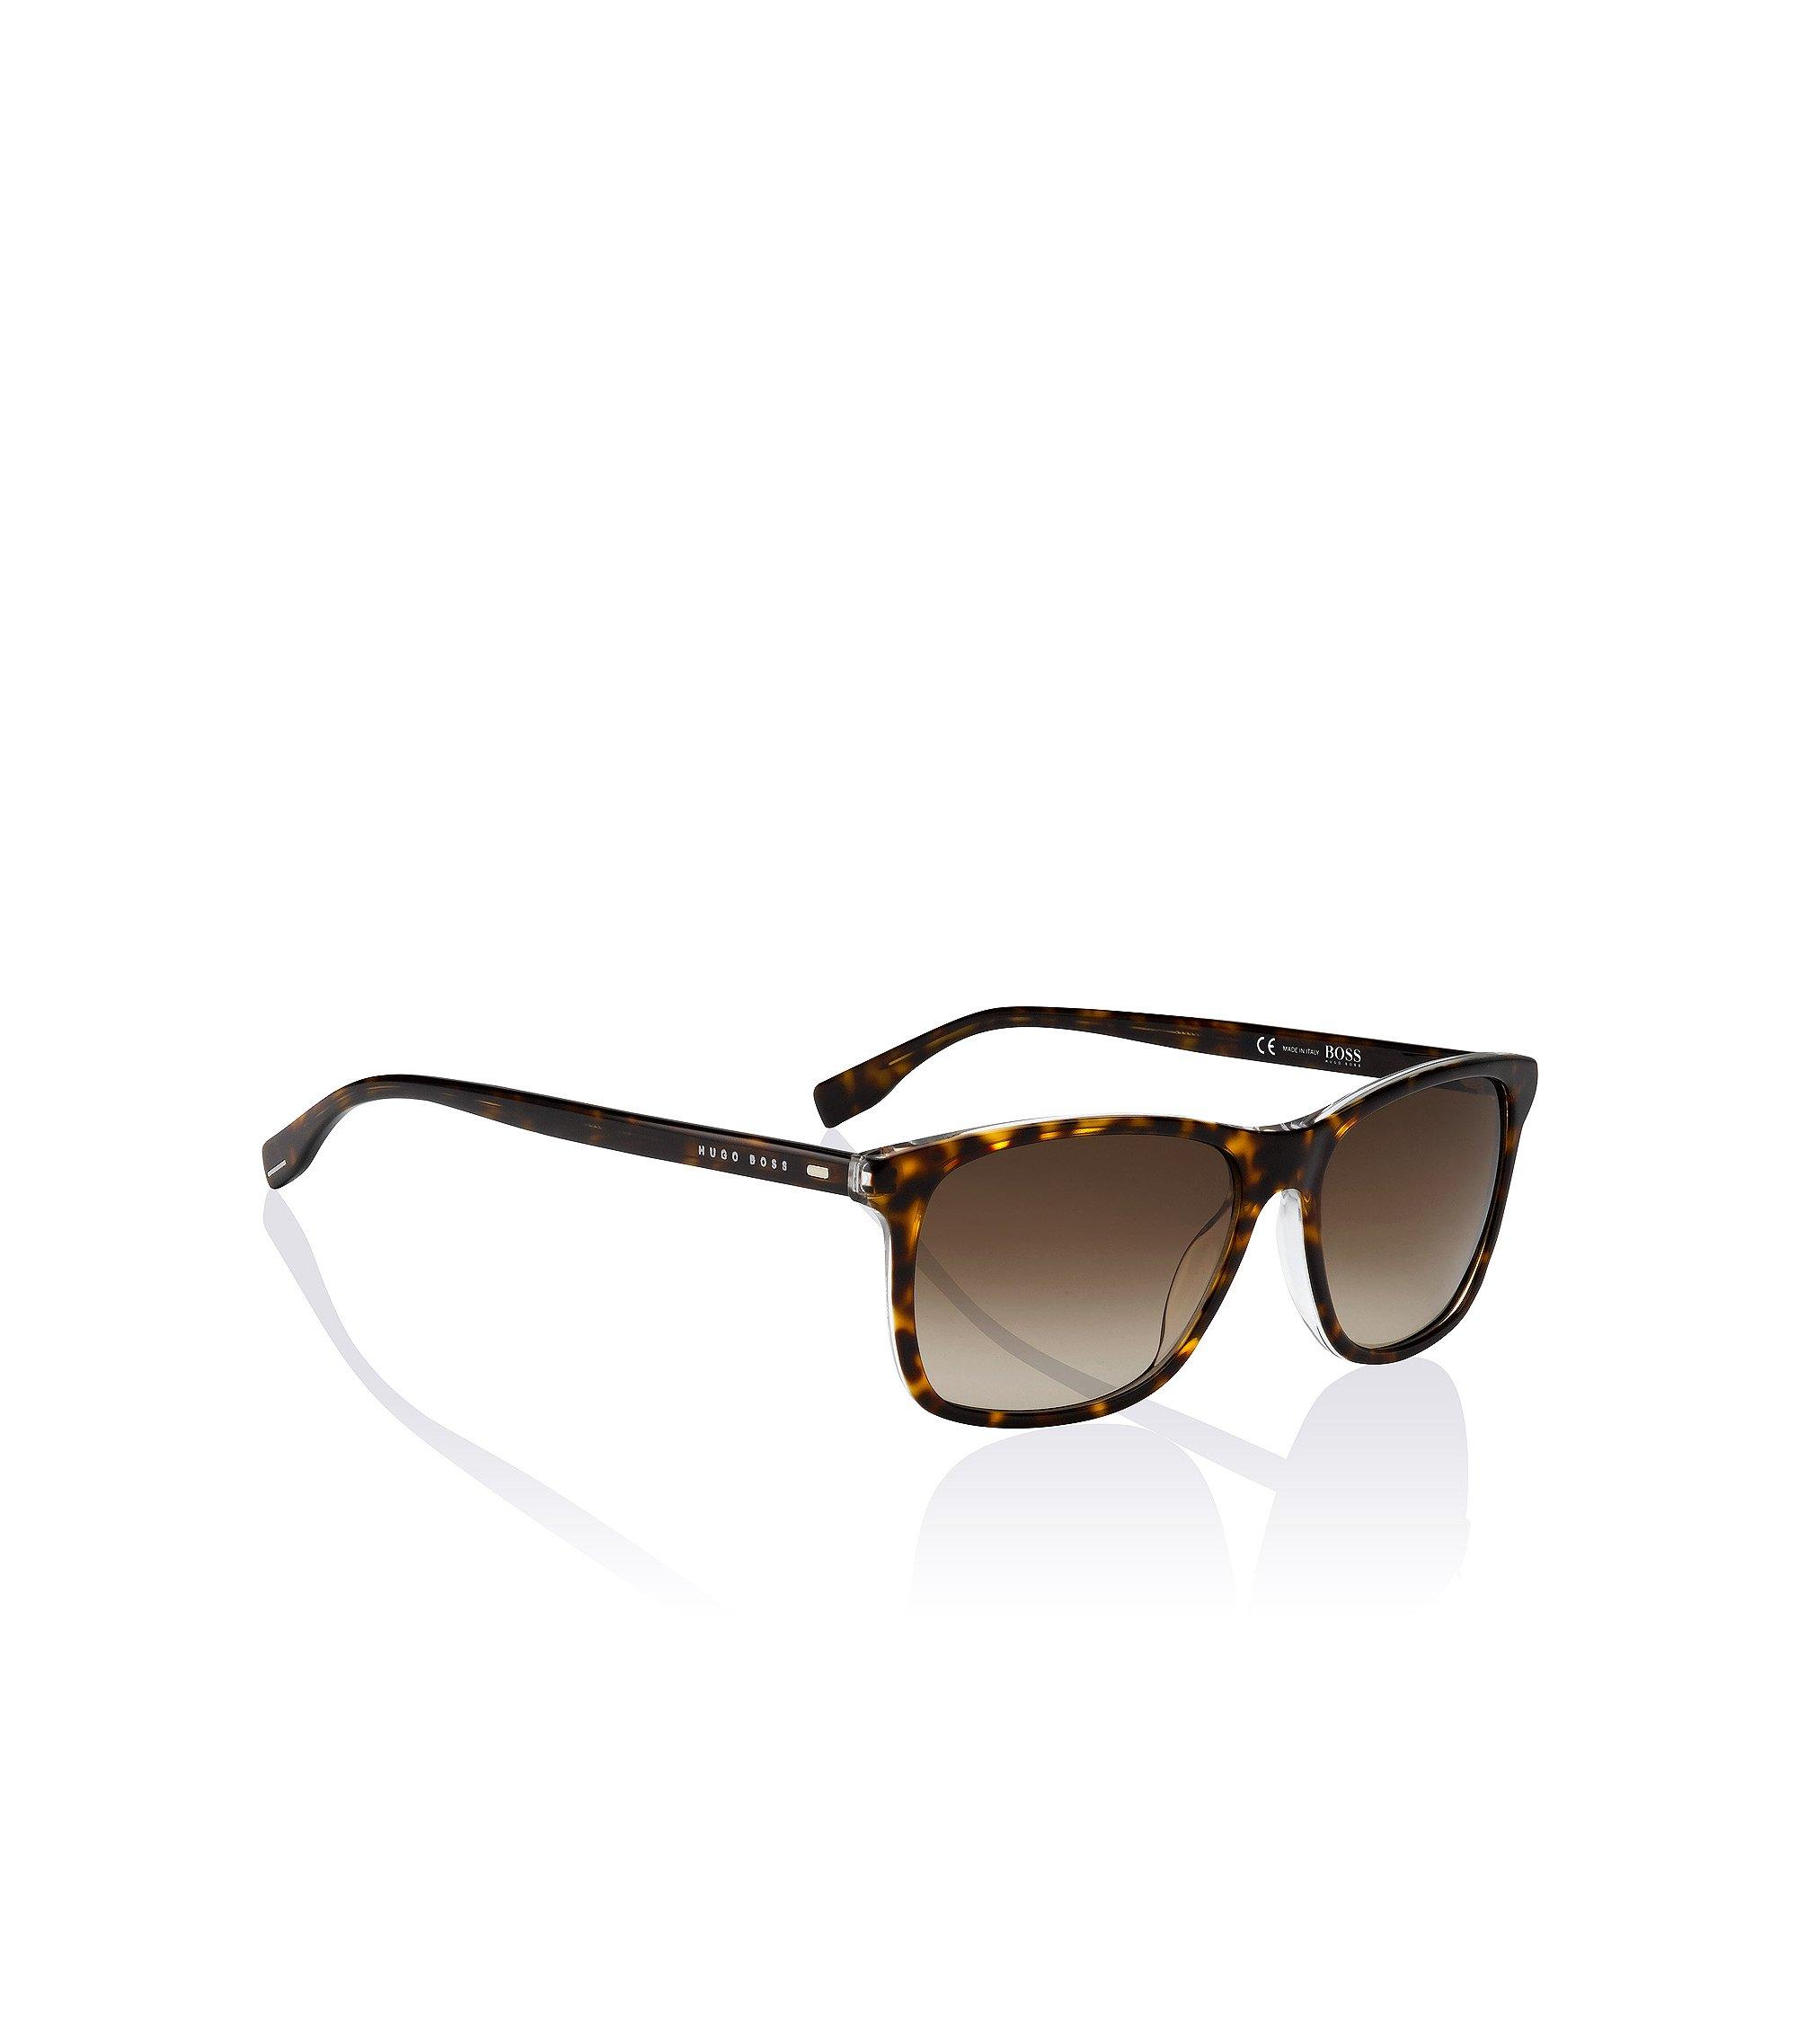 Sonnenbrille ´BOSS 0634/S` aus Acetat, Assorted-Pre-Pack